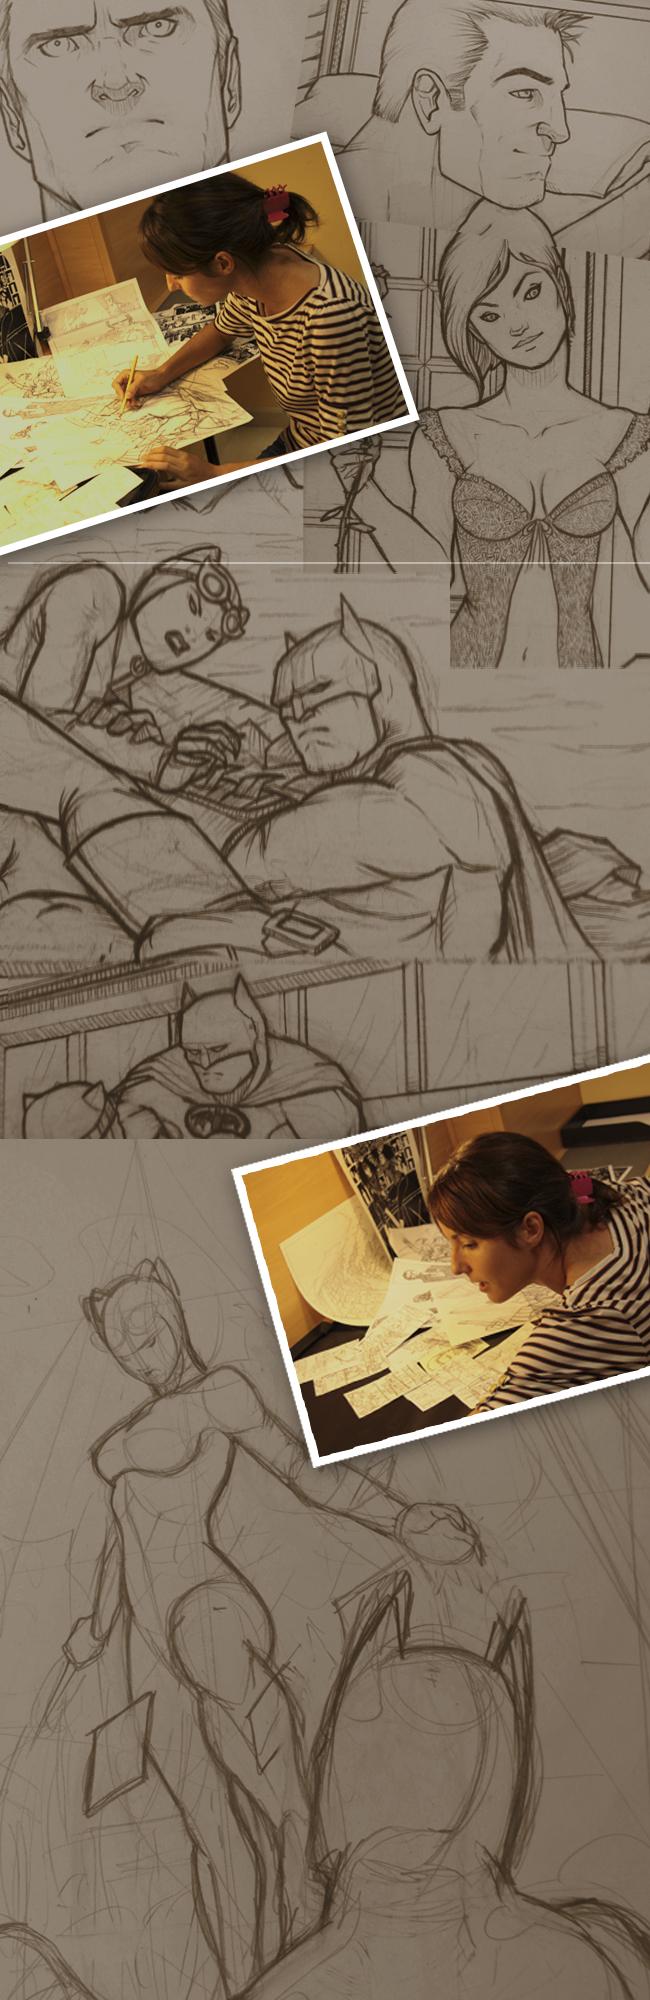 Cristina Coronas-Batman-Dc-Comics-Carlos Diez-Academia C10-1